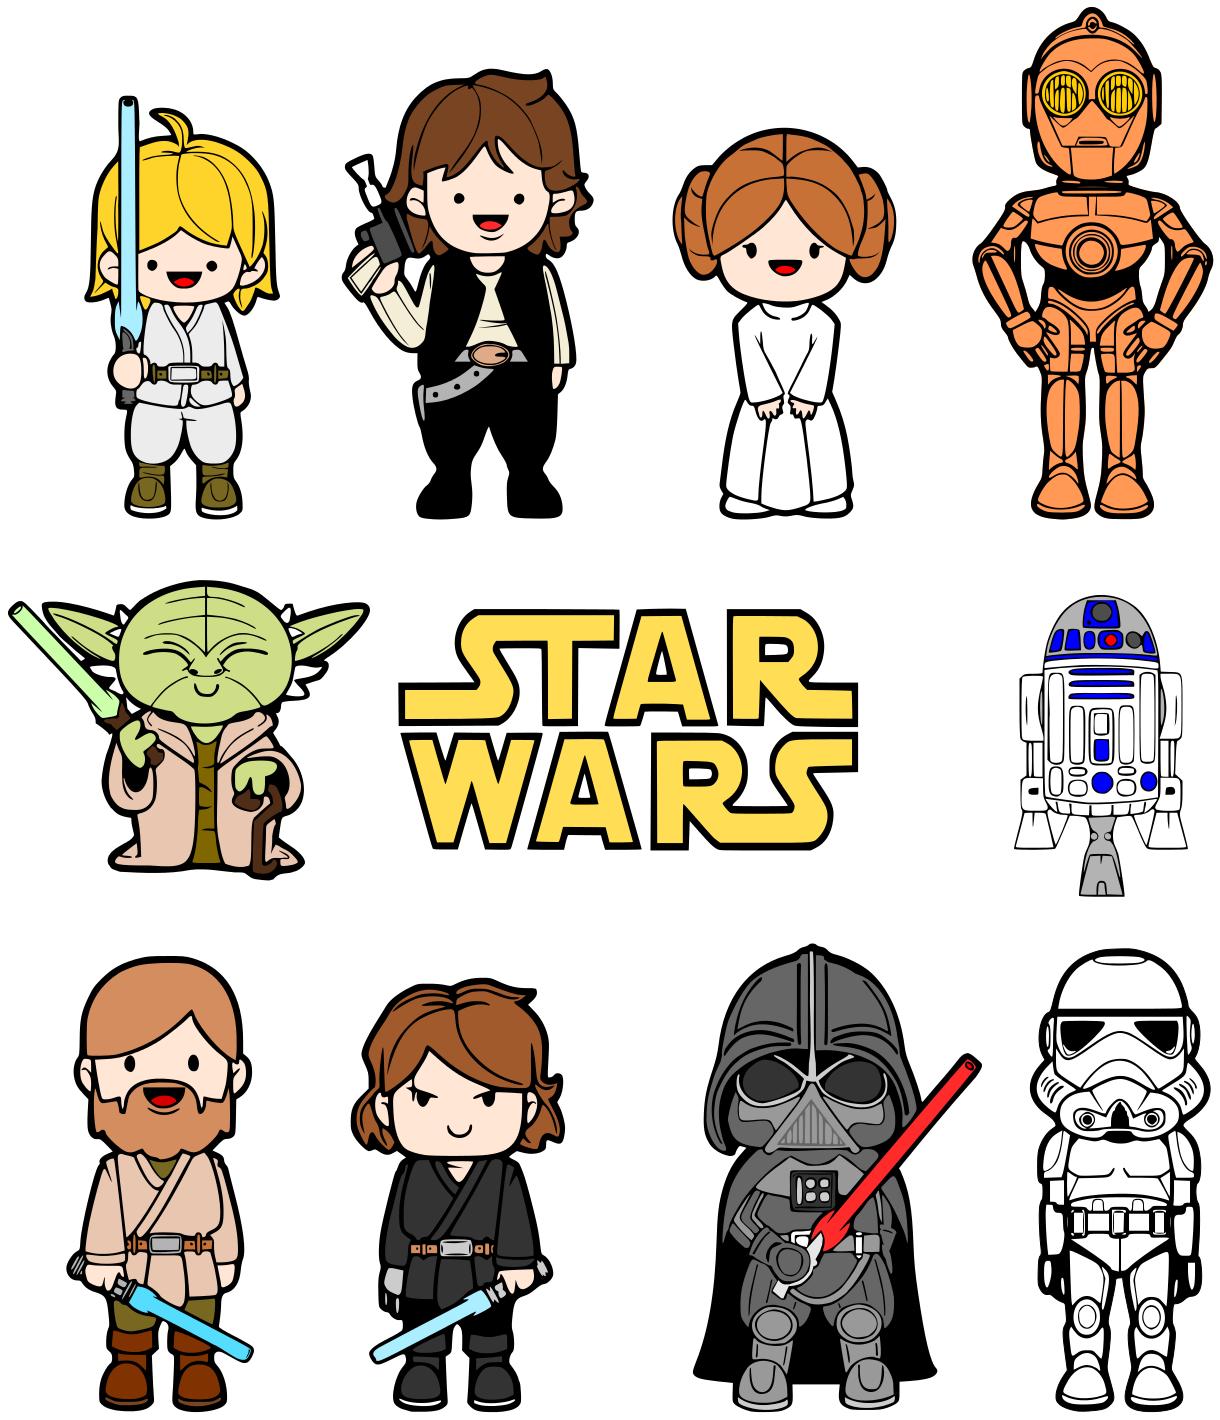 Star wars free download. Starwars clipart cartoon